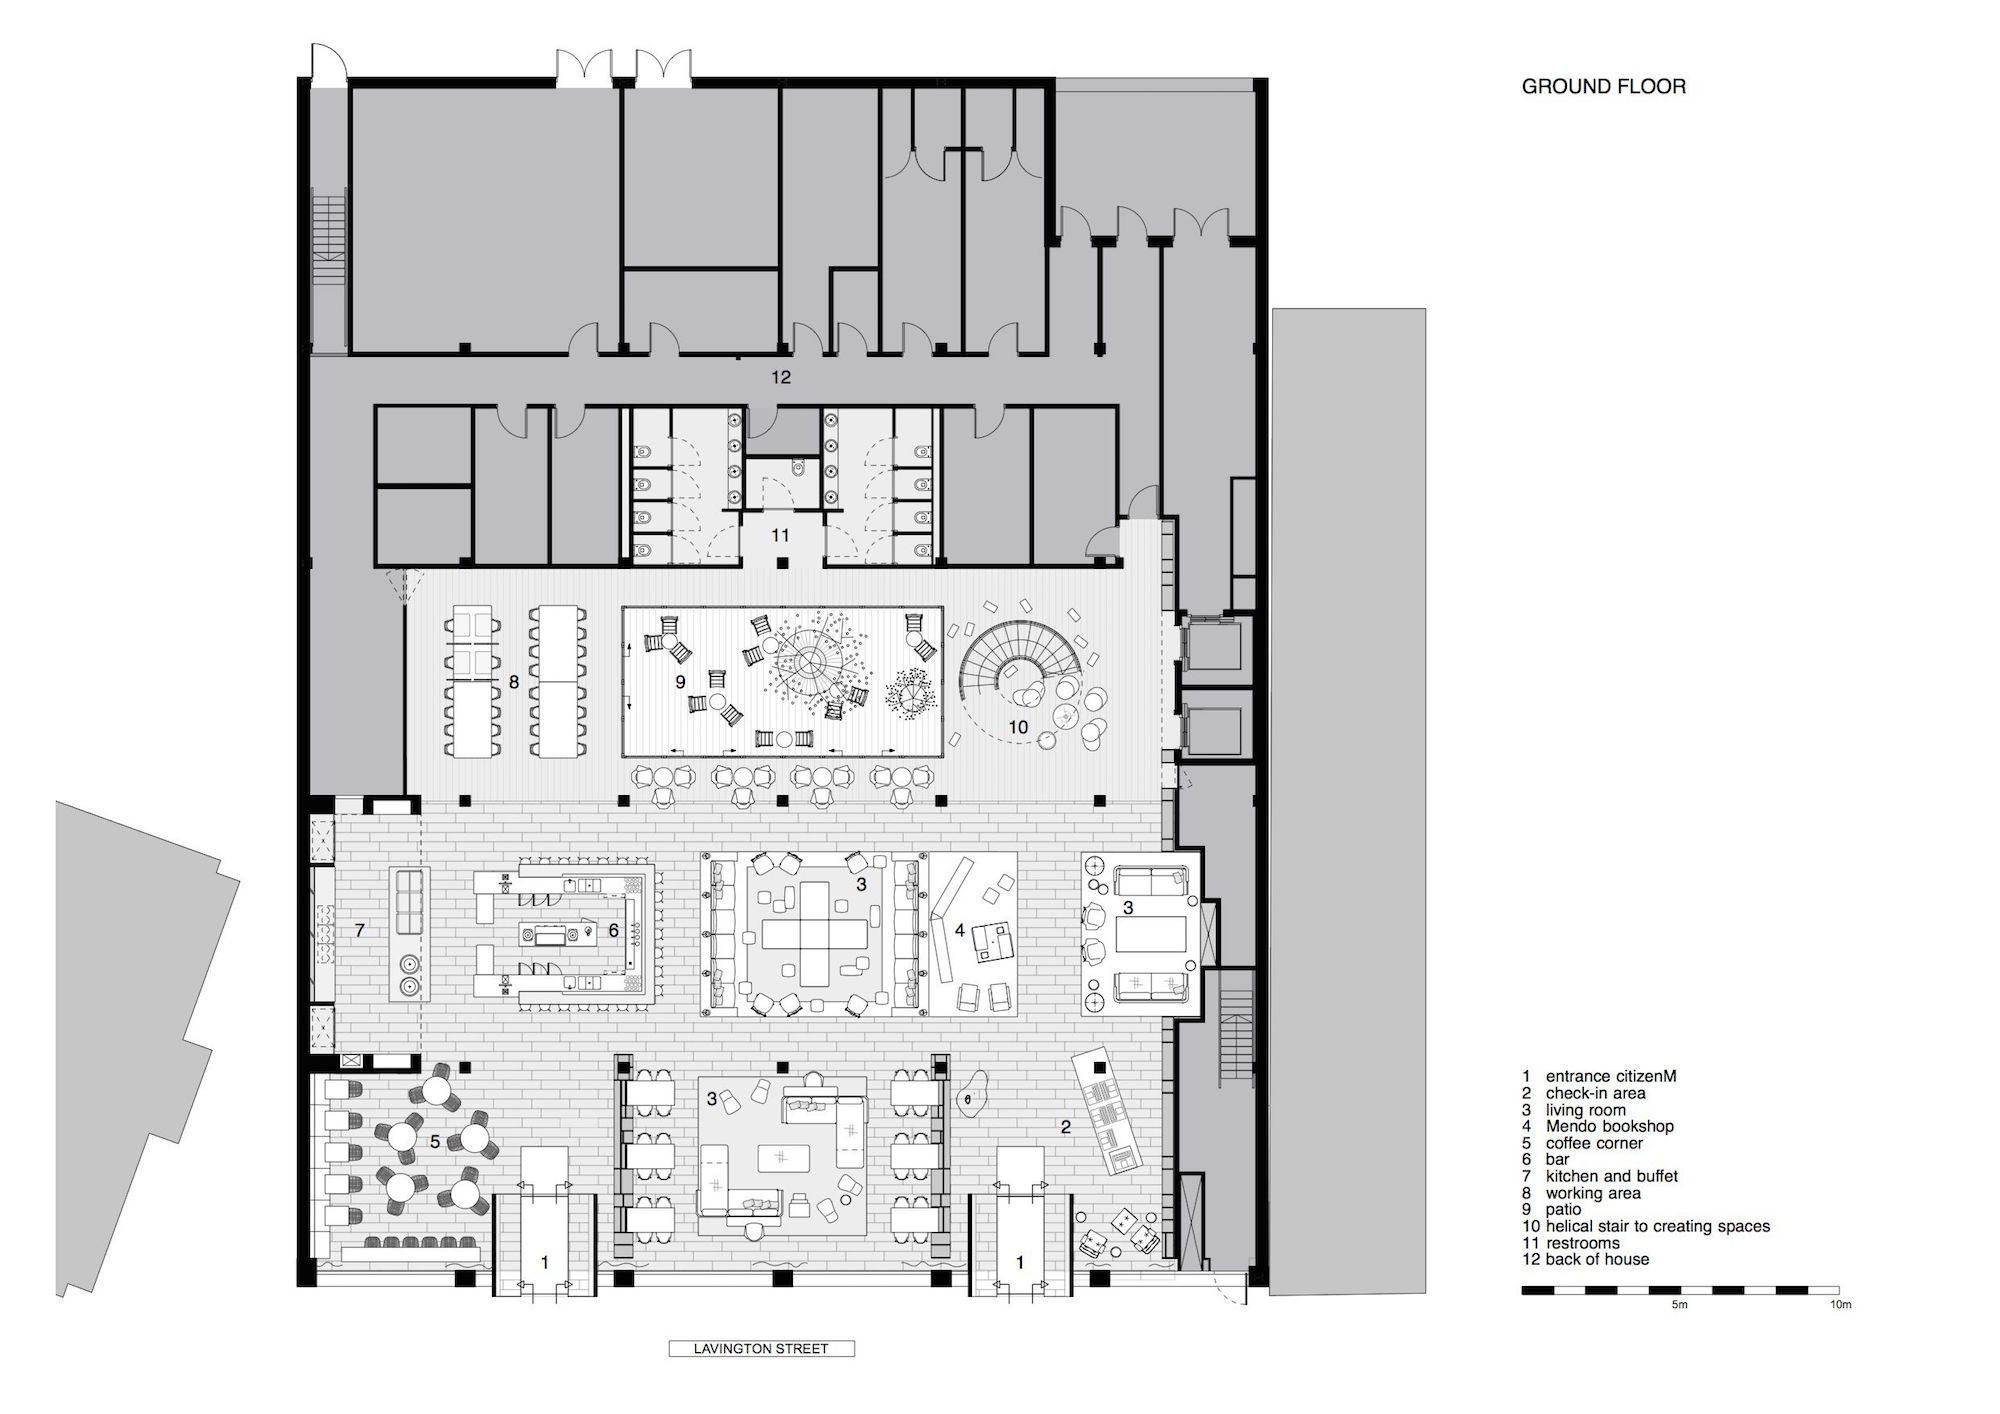 Ground Floor Plan Of The Medieval Castle Of Hever In Kent England 768 962 Castle Floor Plan Floor Plans Mansion Floor Plan